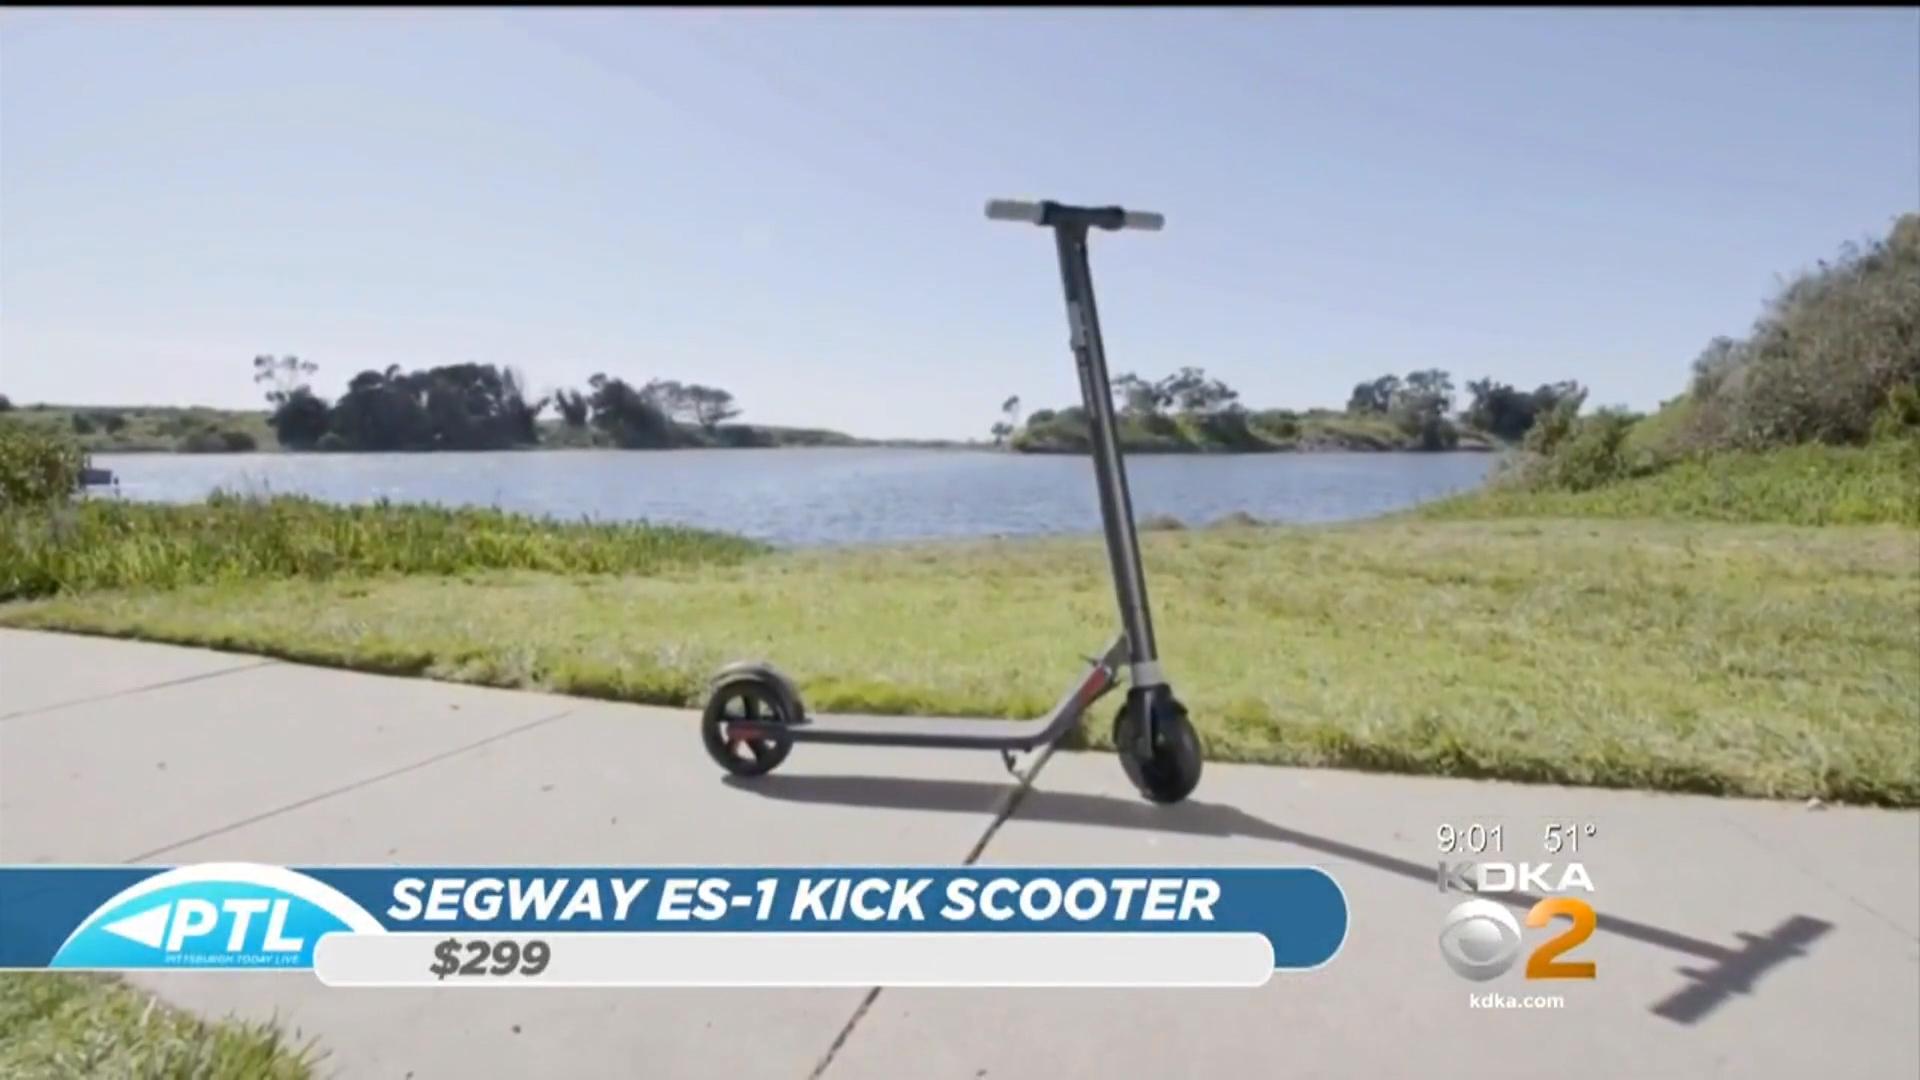 SEGWAY ES-1 KICK SCOOTER - $299Shop Now